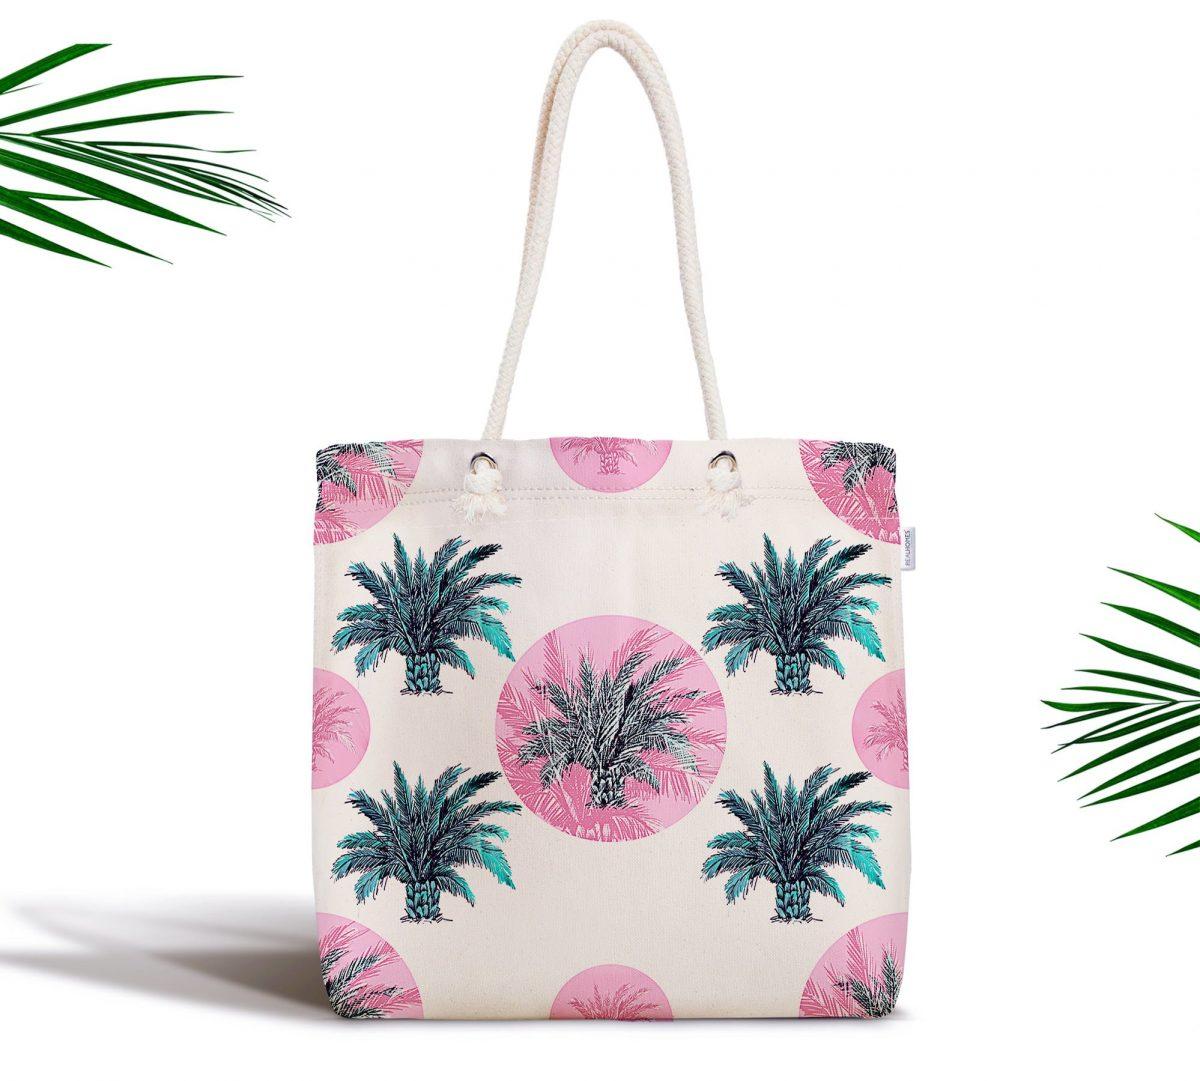 Puanlı Palmiye Desenli Fermuarlı Modern Kumaş Çanta Realhomes